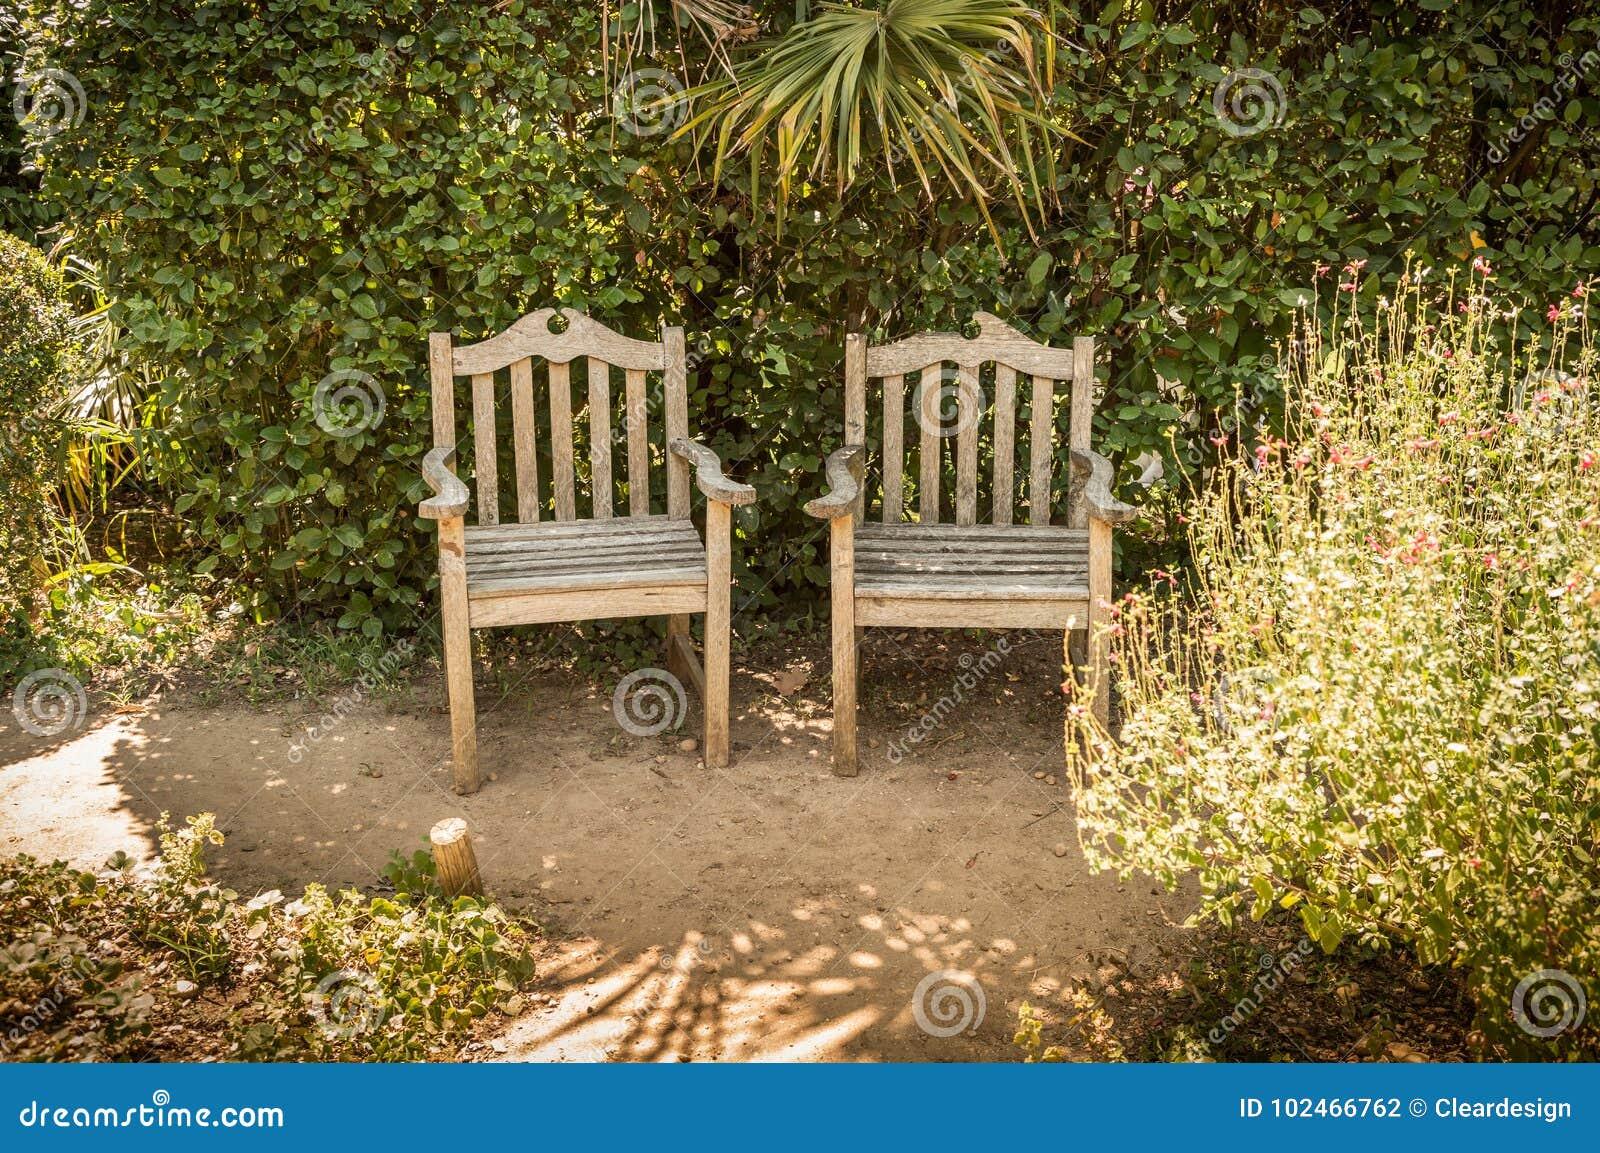 Summer Peaceful Vintage Garden Nook With Metal Furniture Stock Photo ...